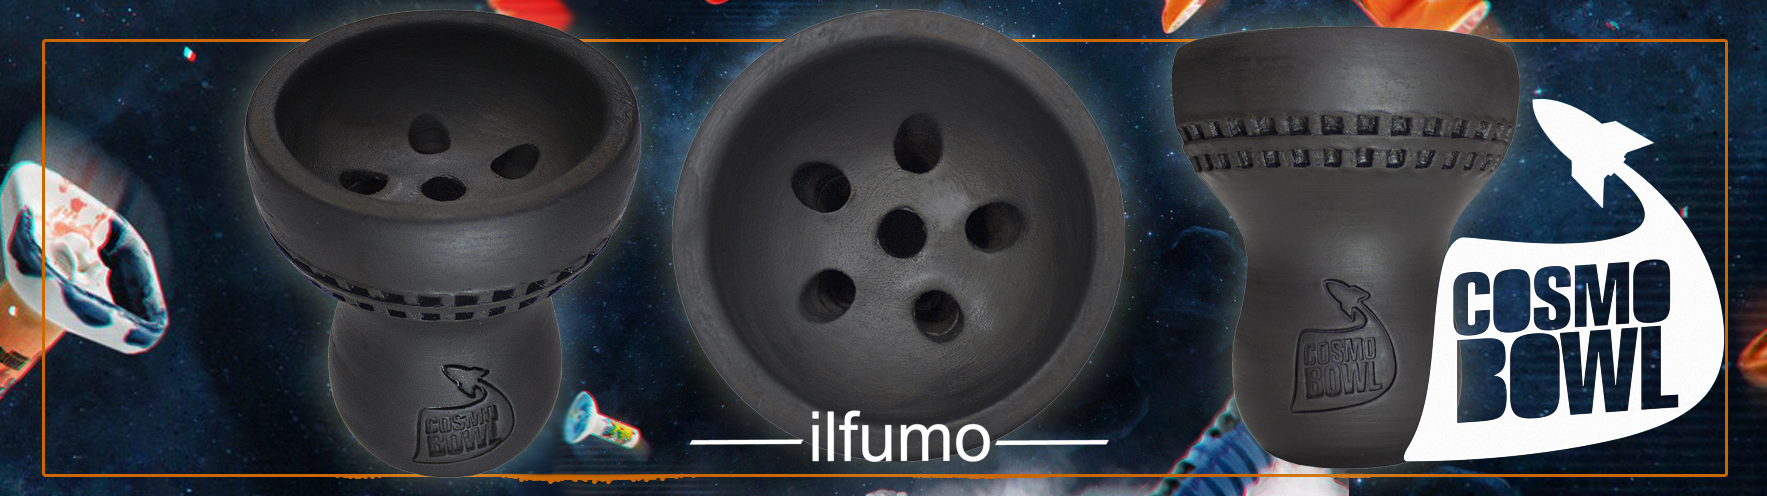 chashka dlja tabaka vneshnjaja cosmo bowl turkish new kupit optom - Чаши Cosmo Bowl для табака